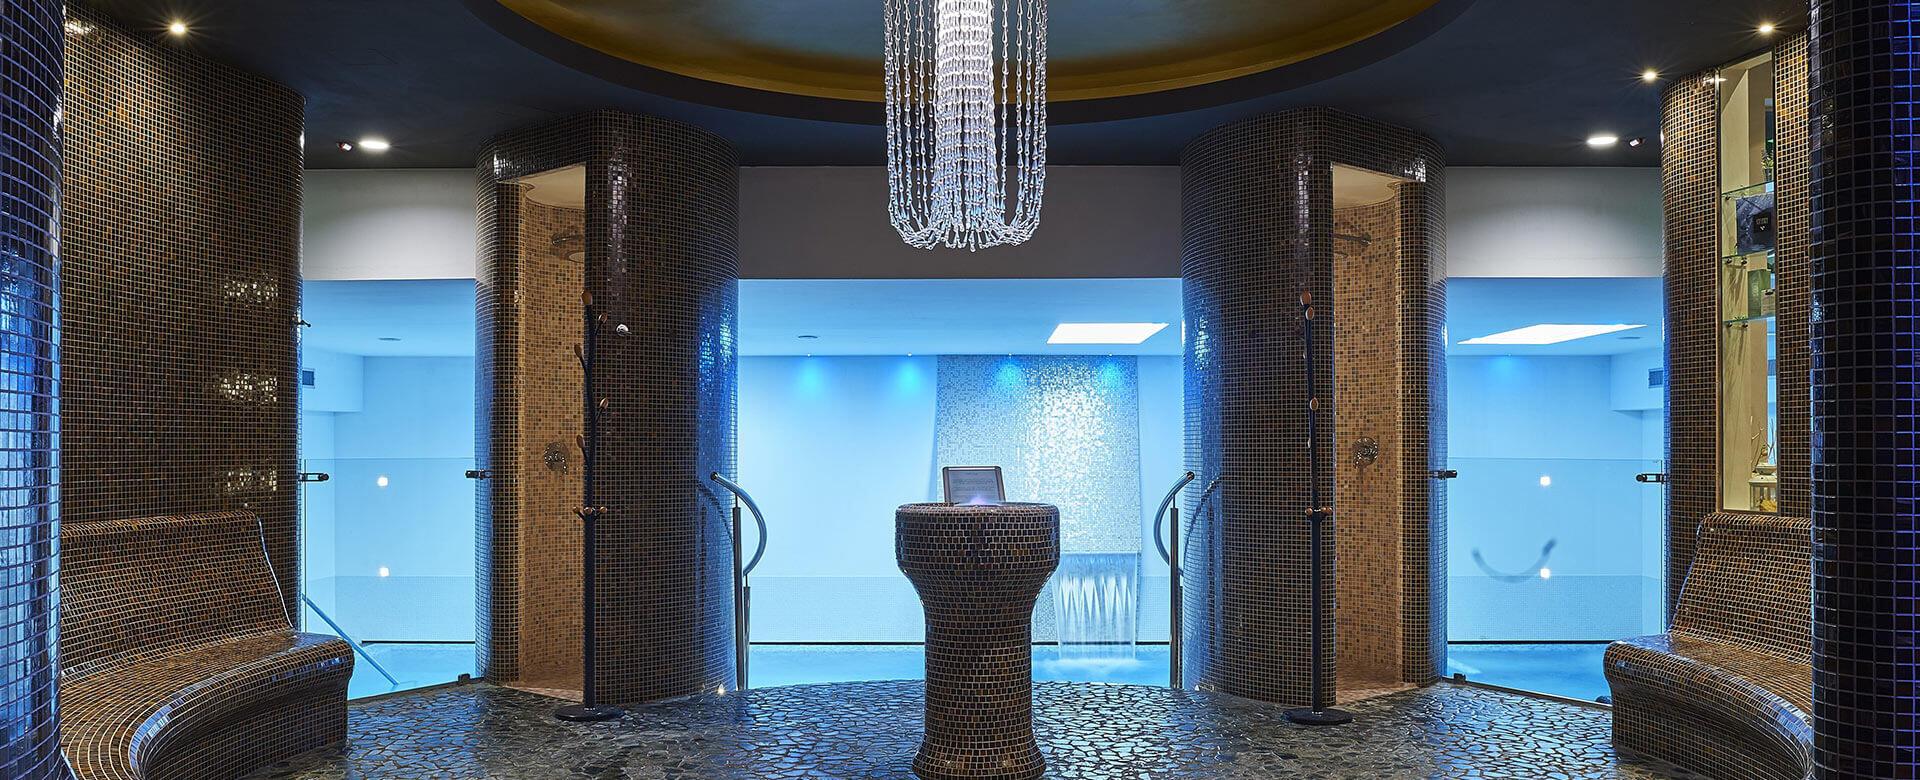 hotelvillaluisa en spa-beauty 004